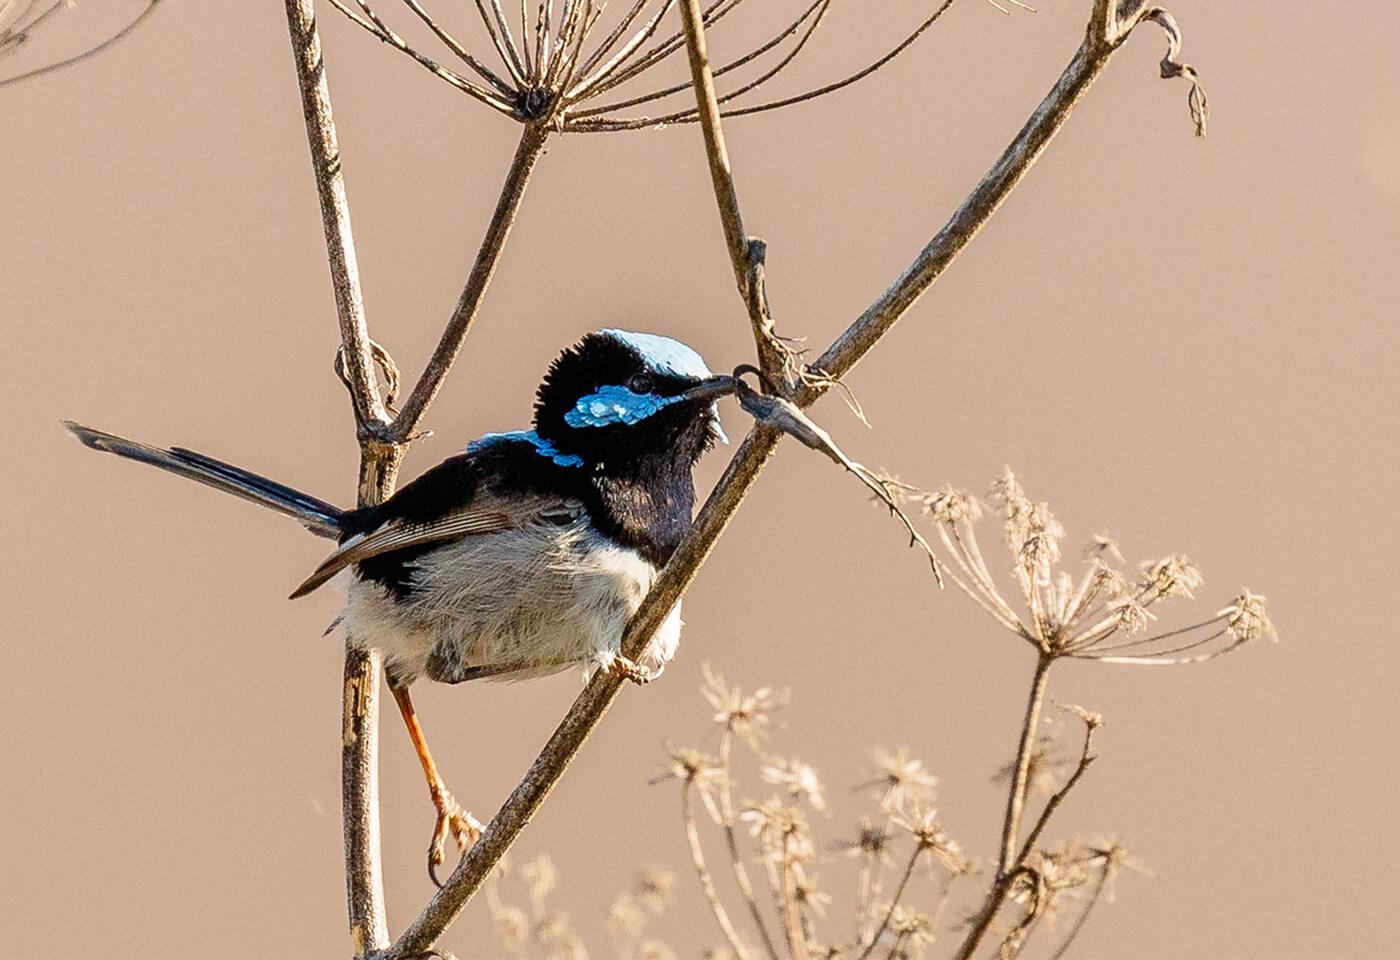 Blue-faced Honeyeater Bird on Dandelions